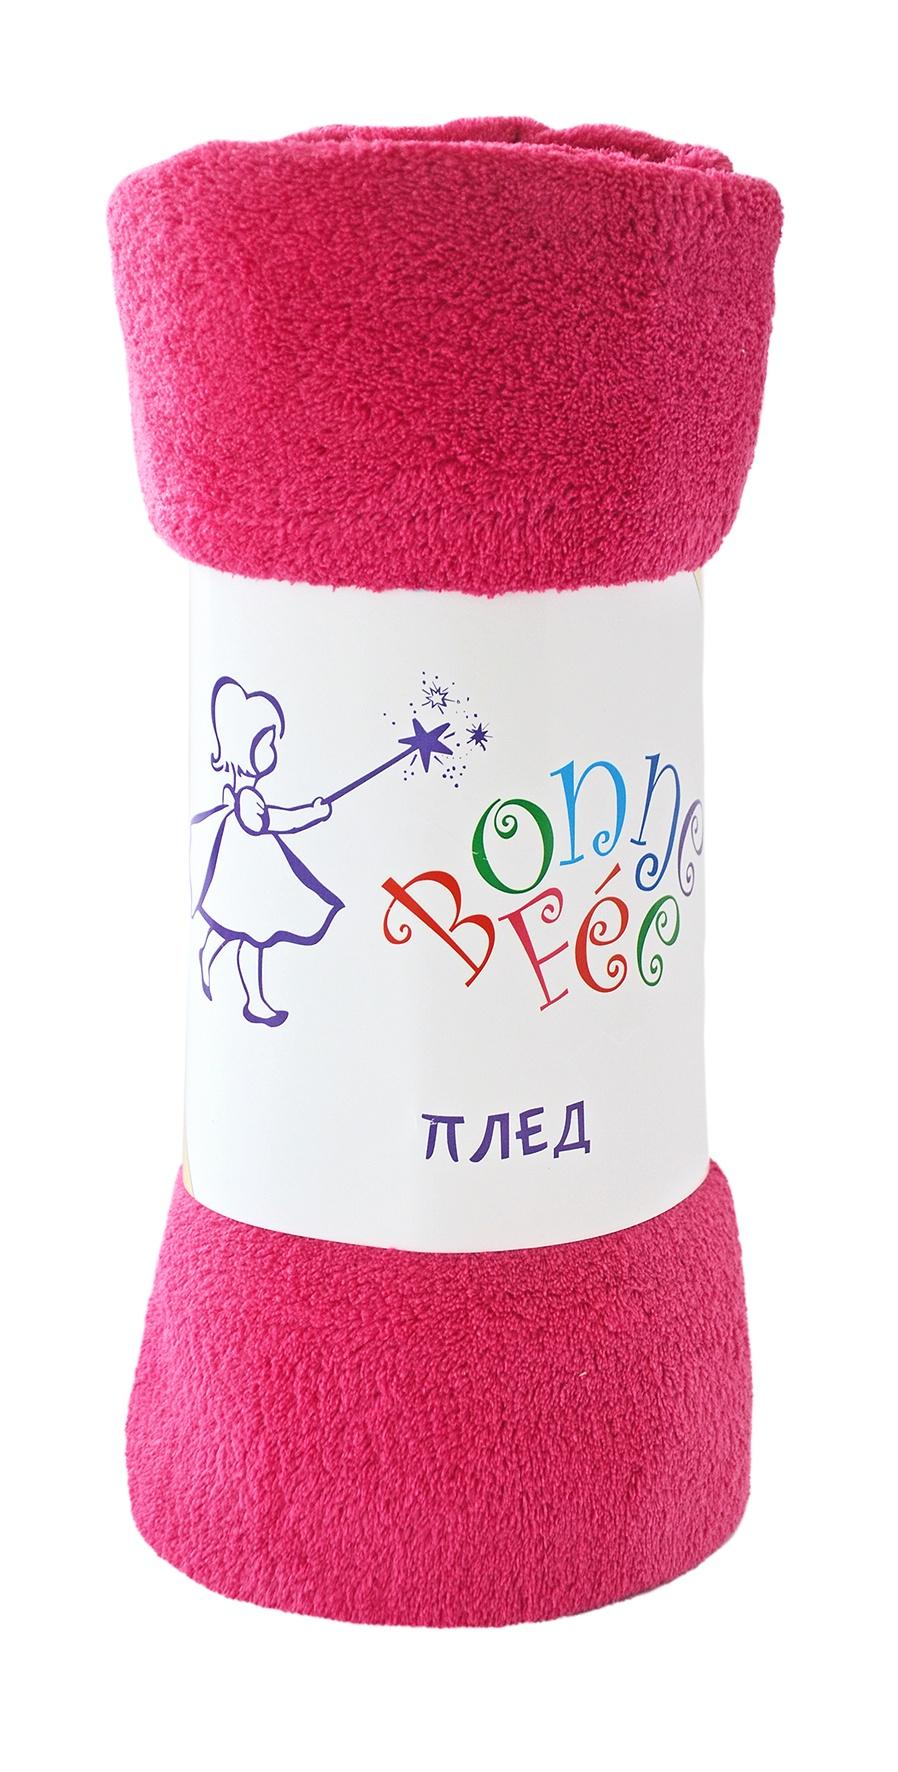 Плед для новорожденного Bonne Fee ПВГ4, розовый